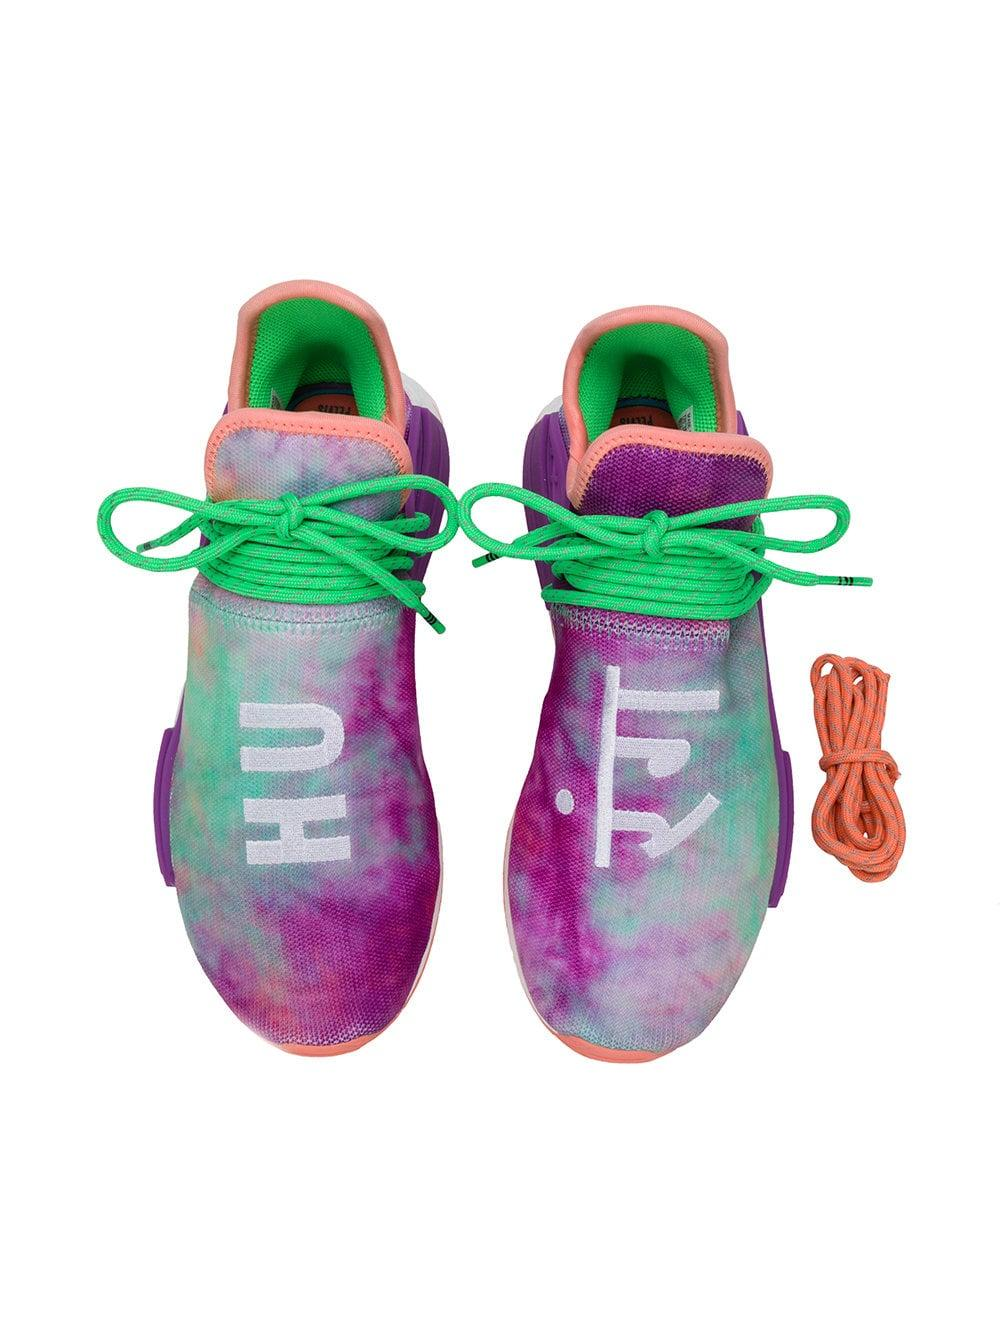 60f9293e409653 Adidas - Multicolor Tie-dye Holi Hu Nmd Sneakers for Men - Lyst. View  fullscreen